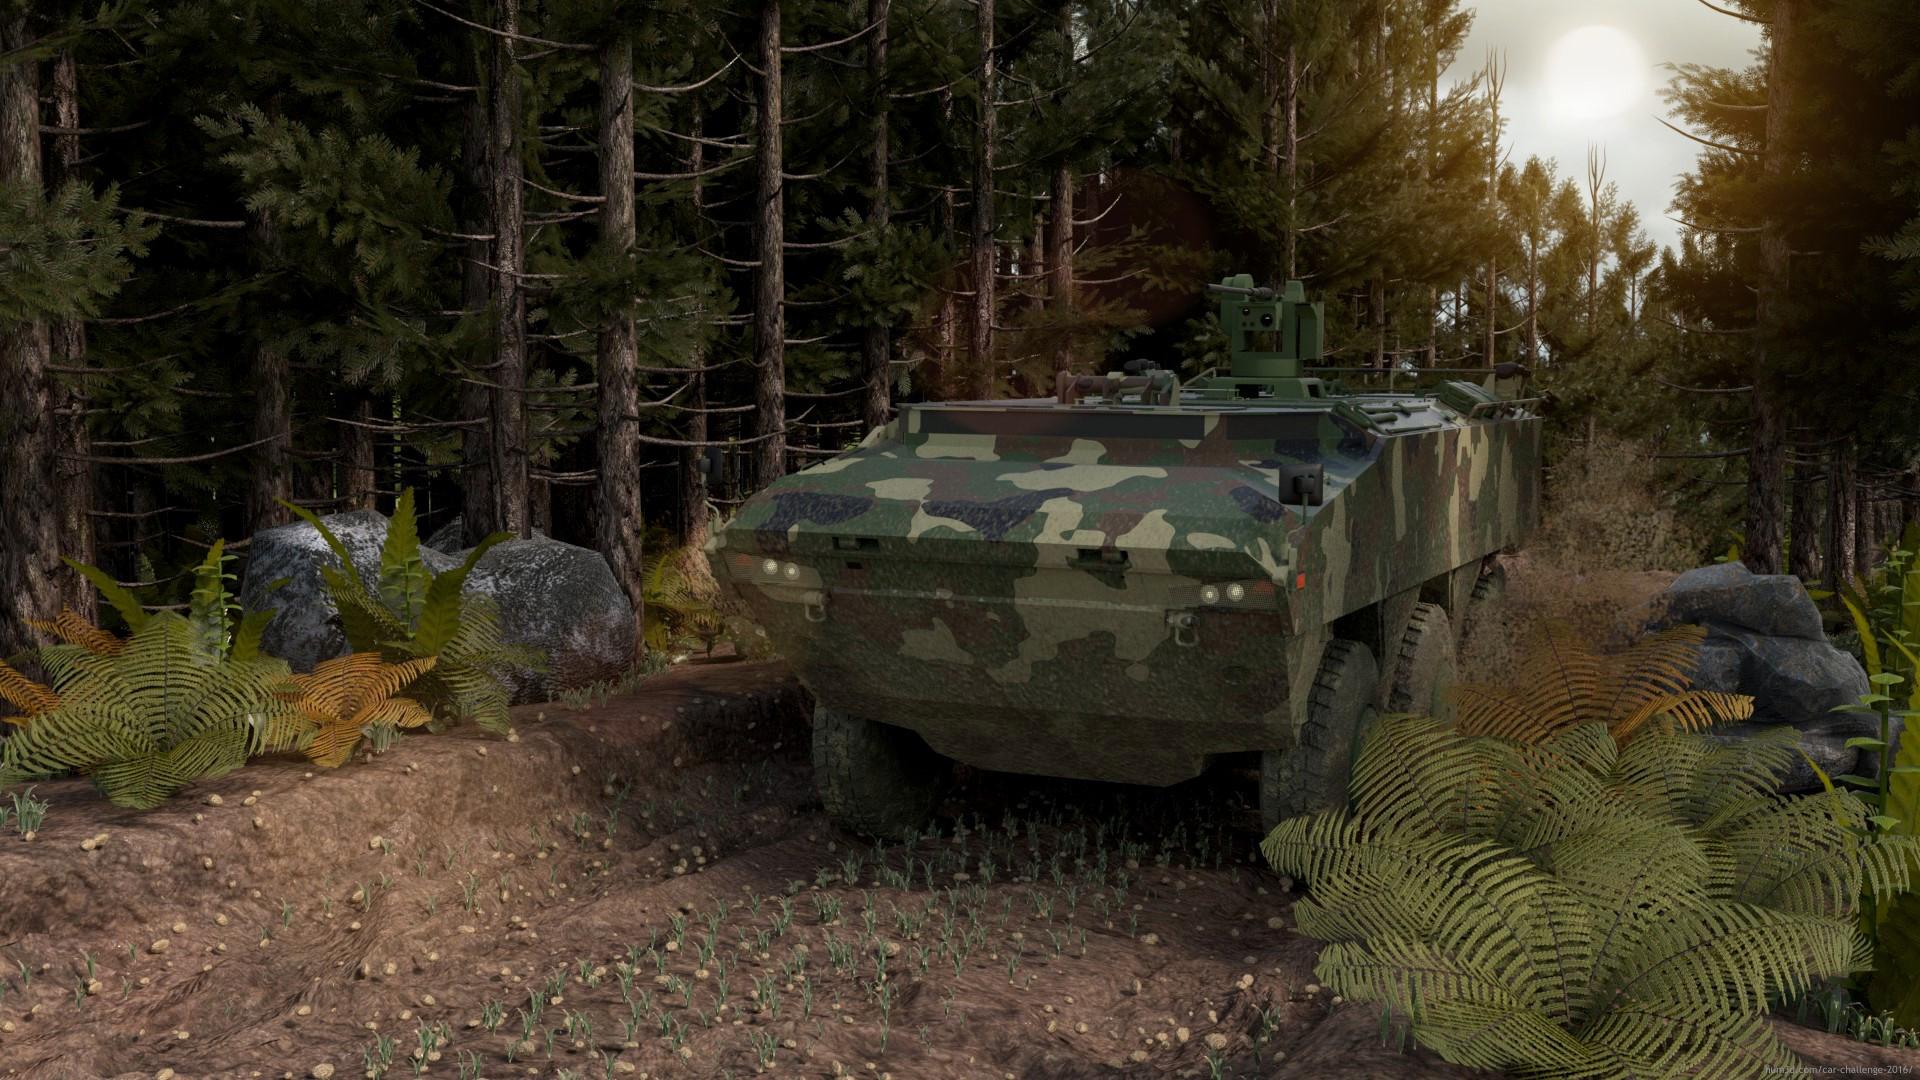 Pars 6x6 Military Vehicle 3d art